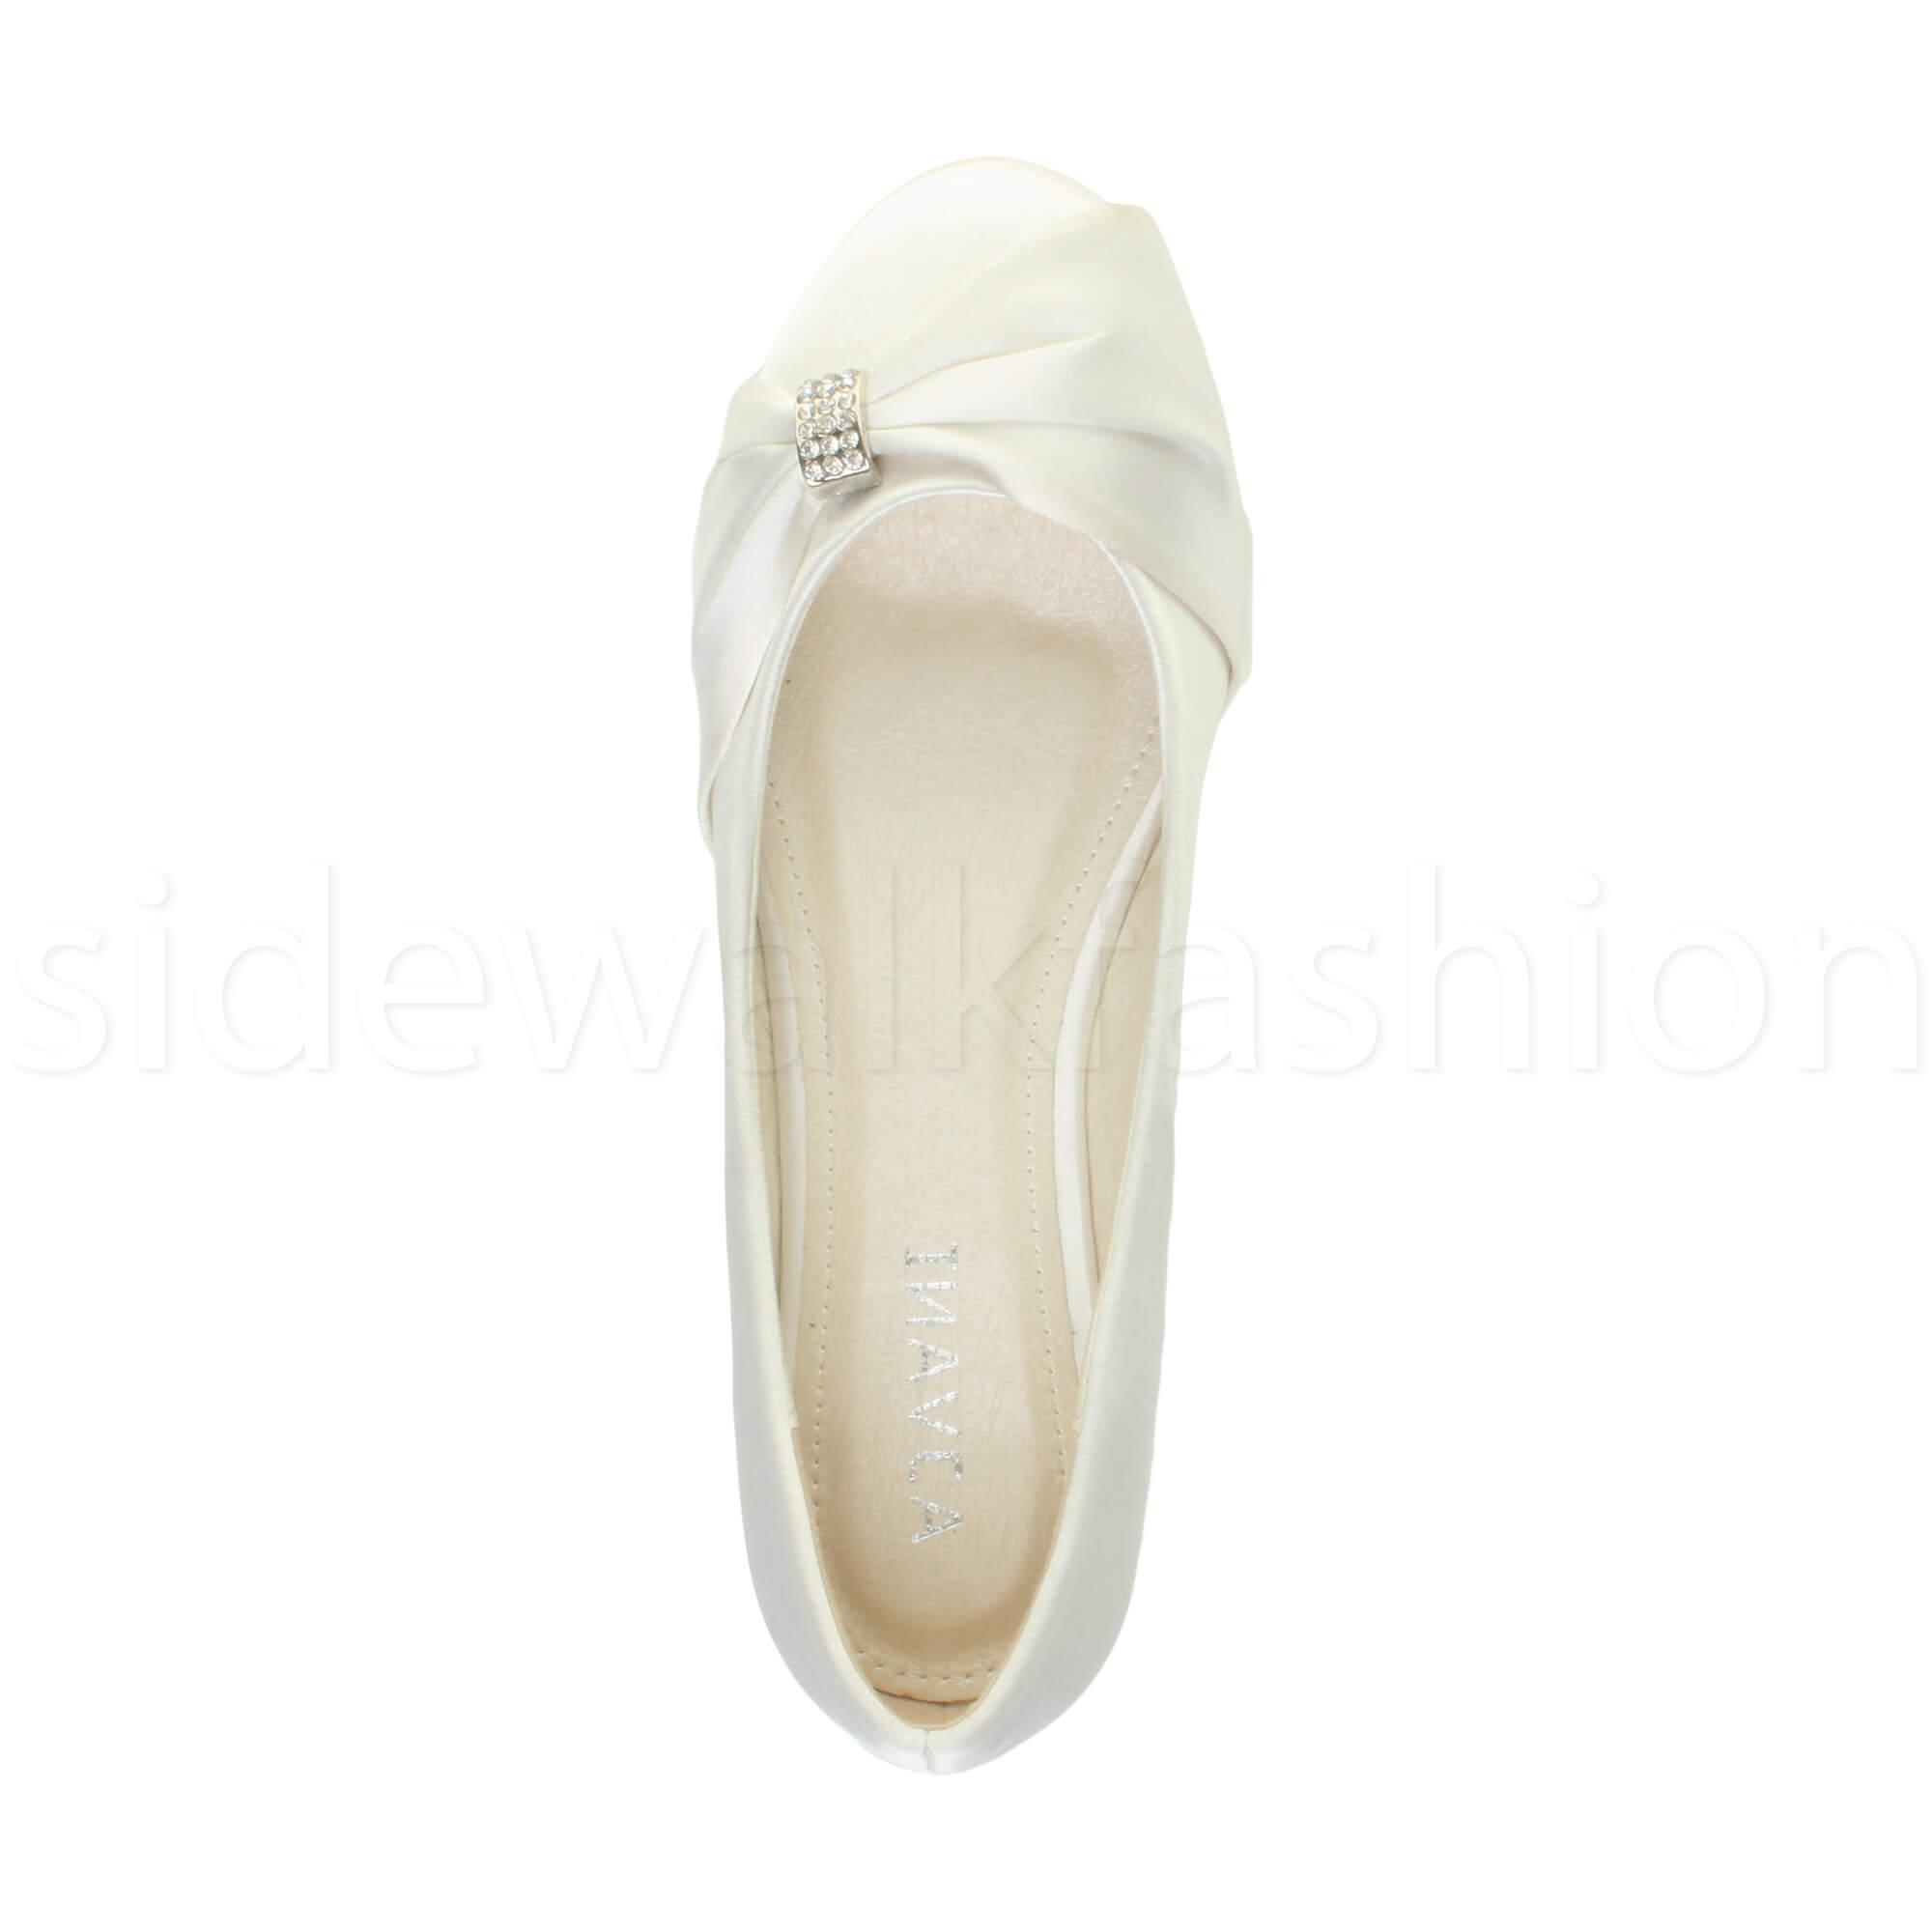 Womens-ladies-flat-wedding-bridesmaid-ruched-diamante-bridal-shoes-pumps-size thumbnail 40